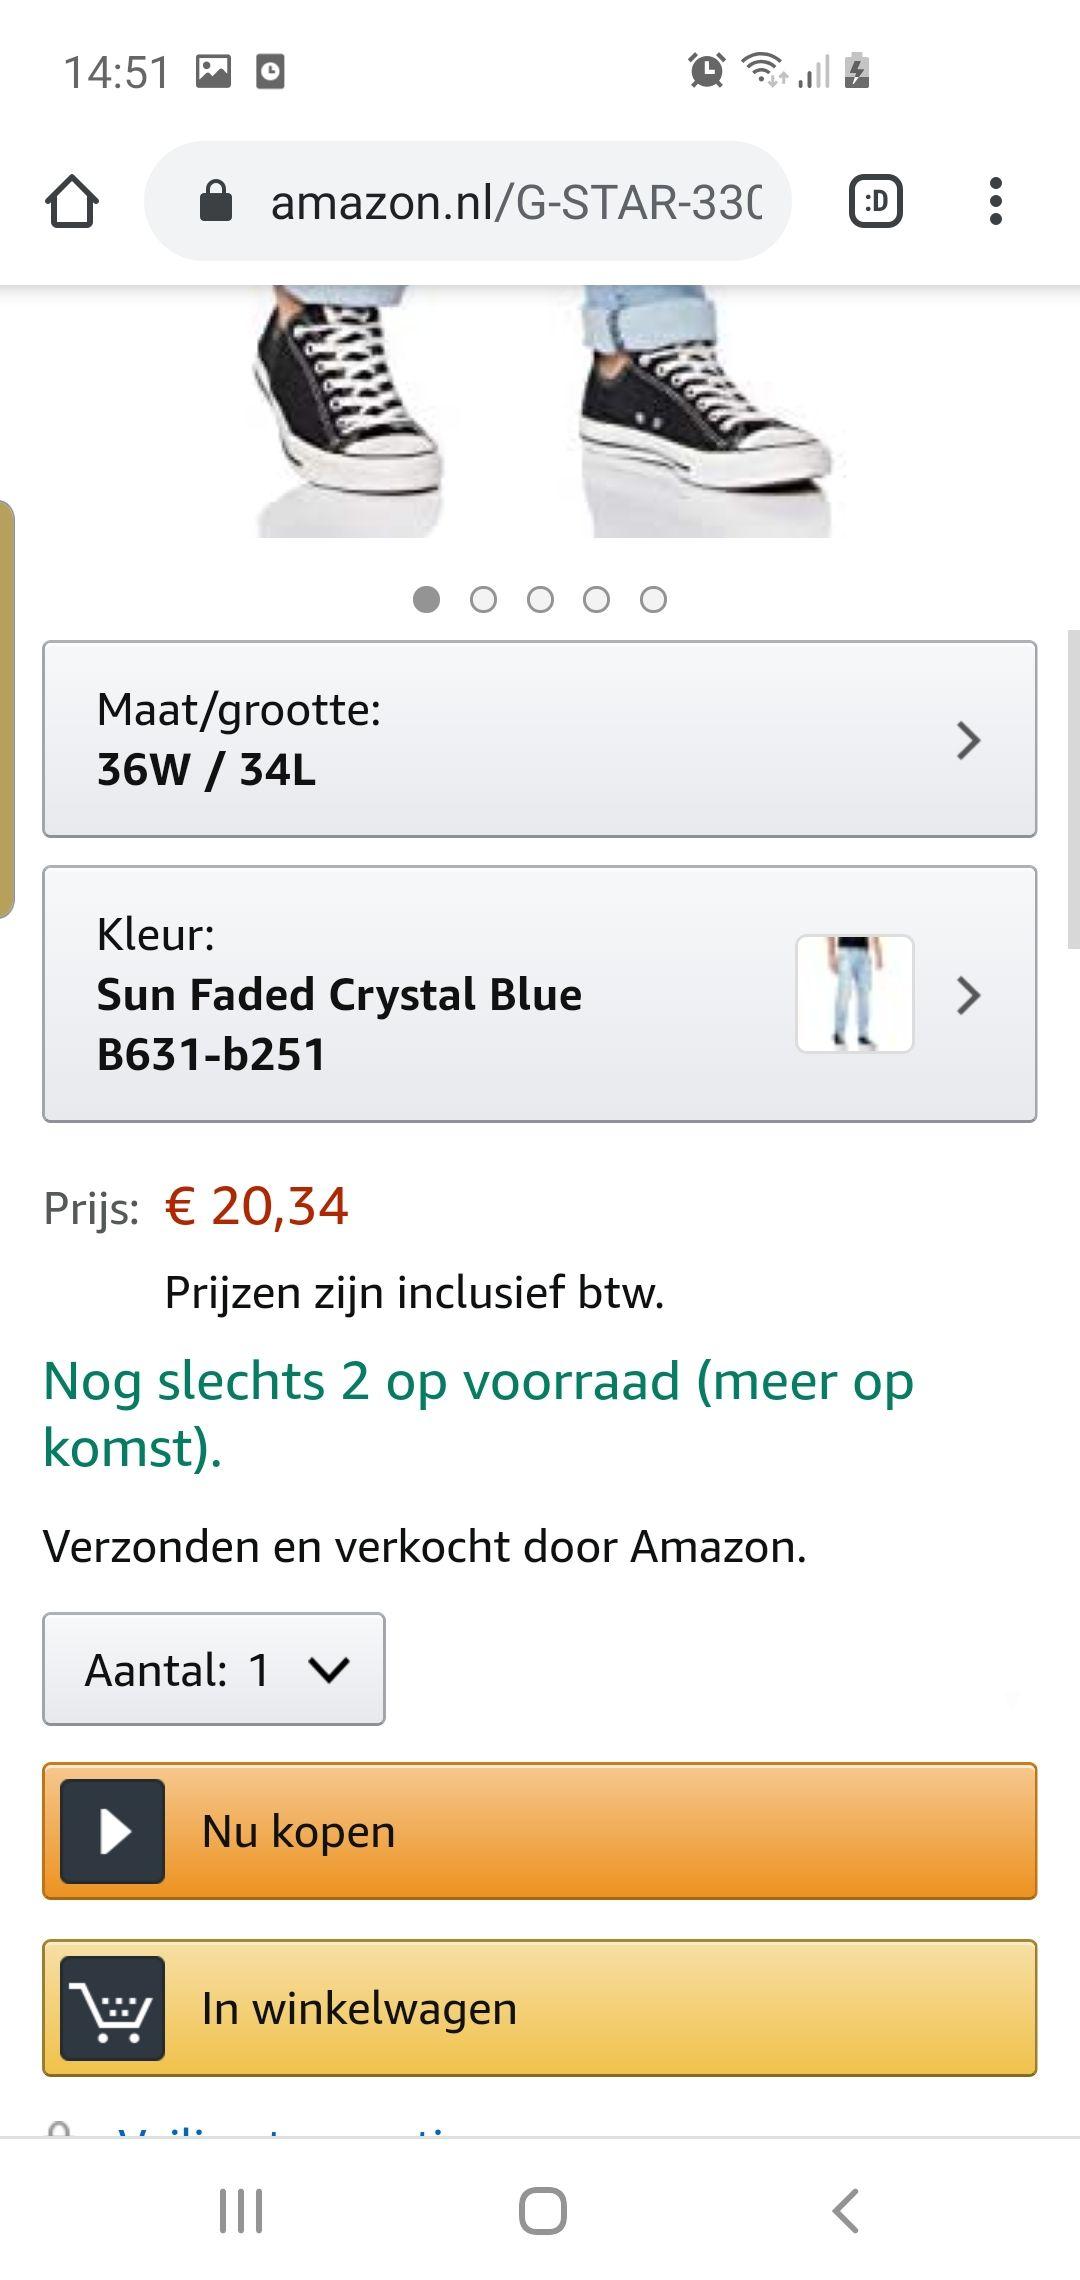 G star broek amazon.nl